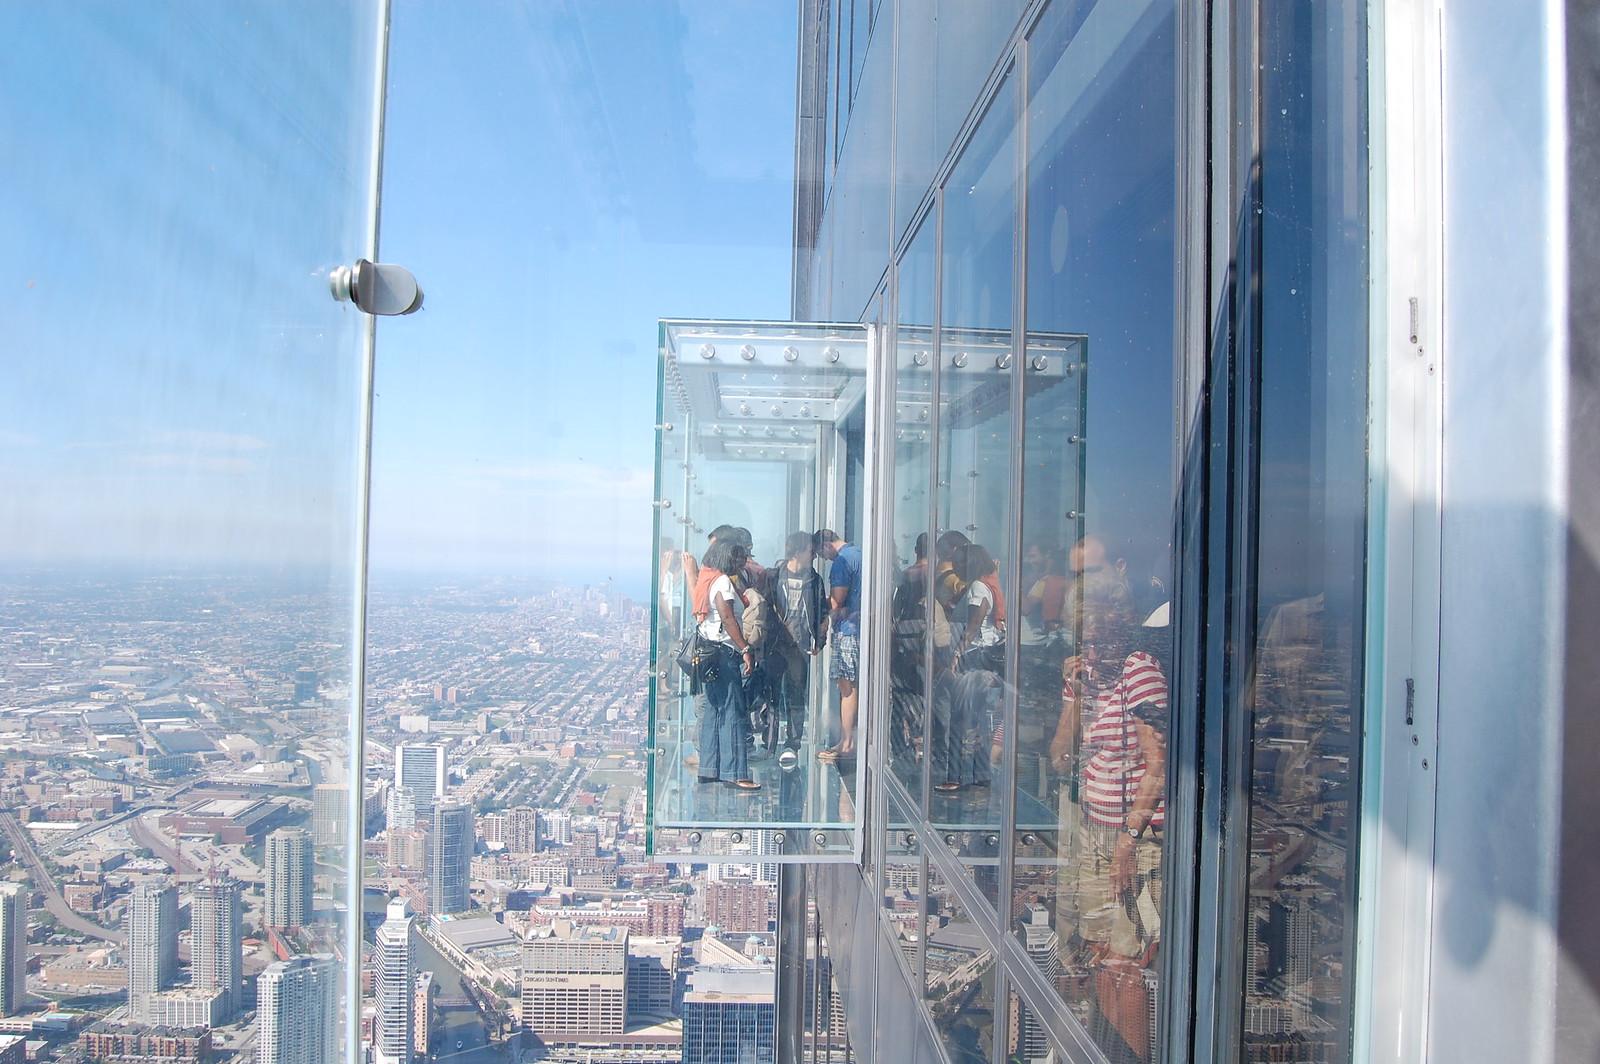 SkyDeck Chicago Willis Tower, 9/4/09